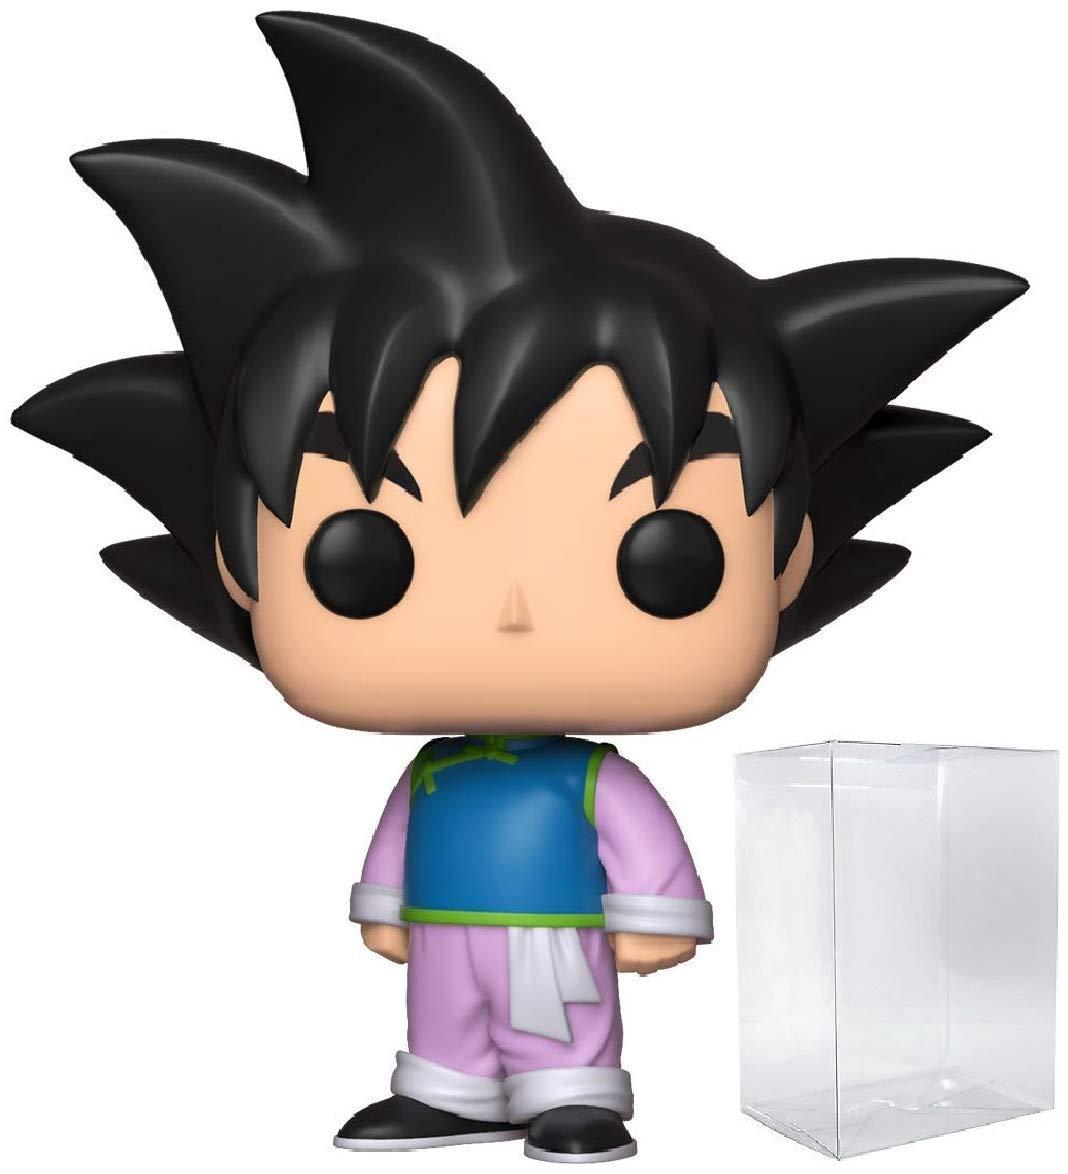 Includes Compatible Pop Box Protector Case Funko Anime: Dragon Ball Z Goten Pop Vinyl Figure